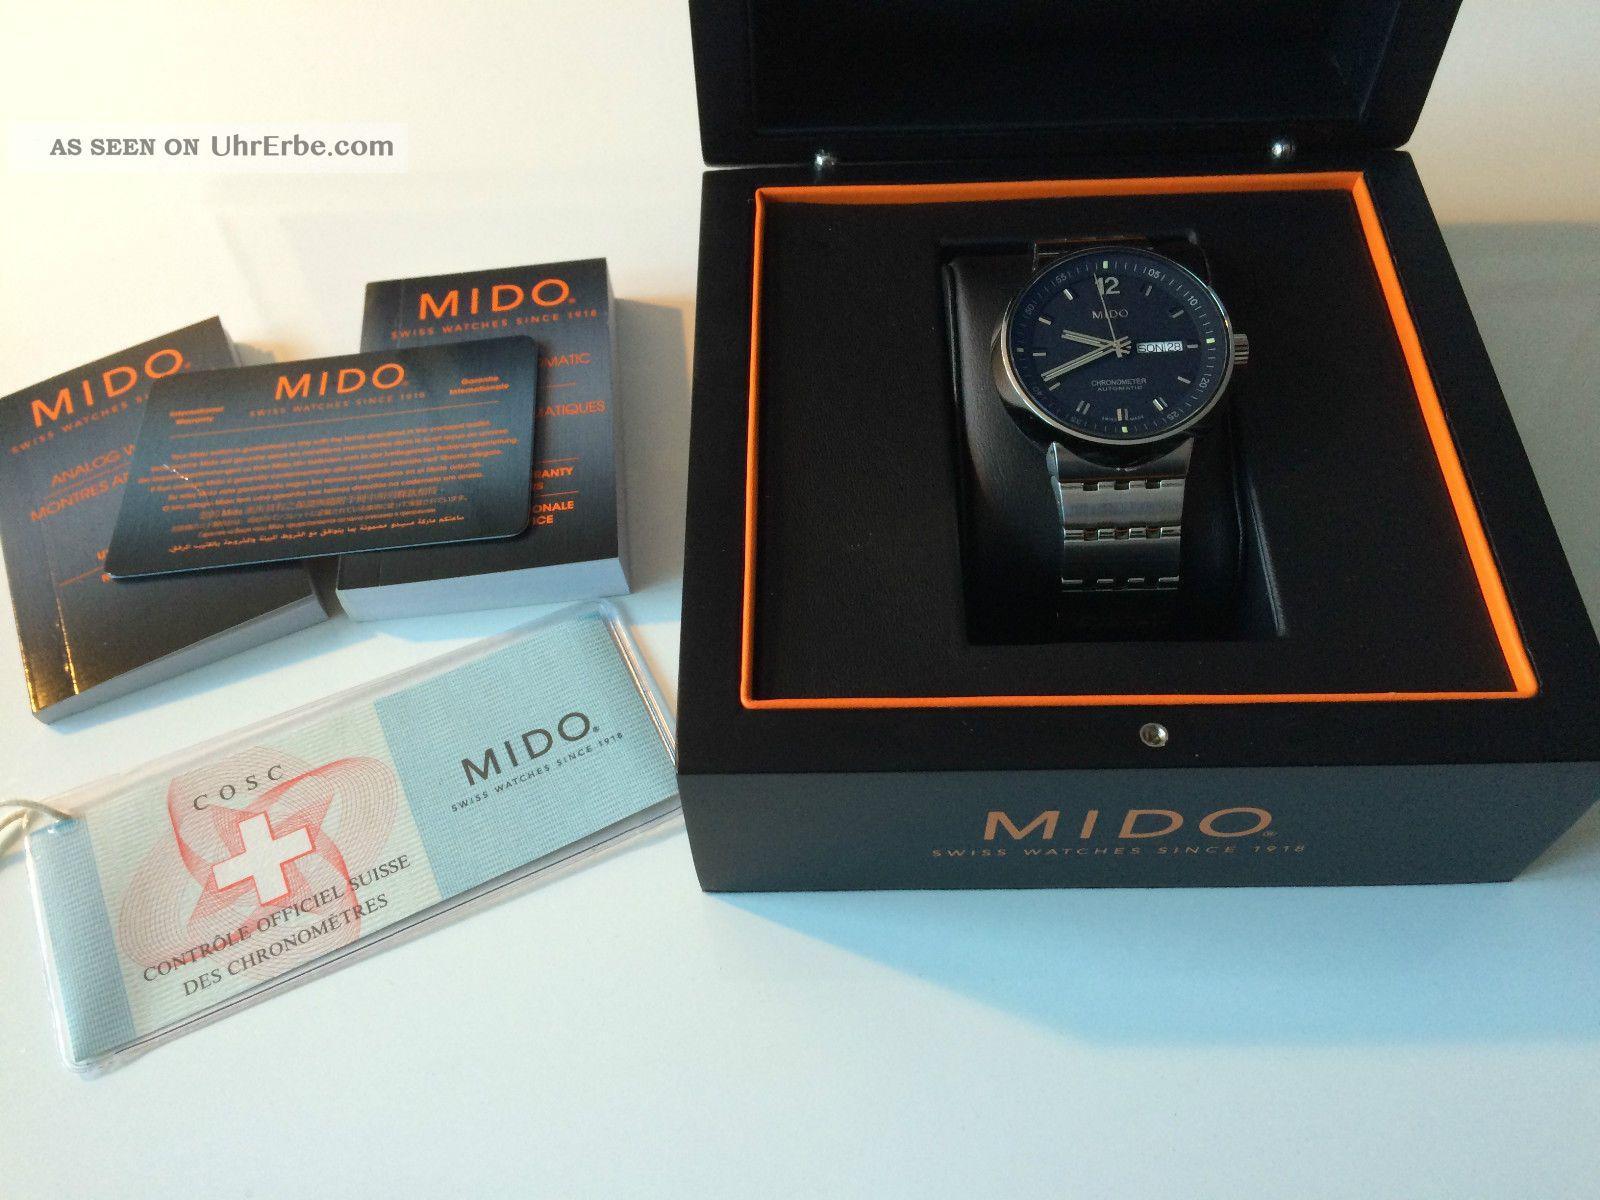 Mido All Dial Chronometer,  Durchmesser 42mm Armbanduhren Bild